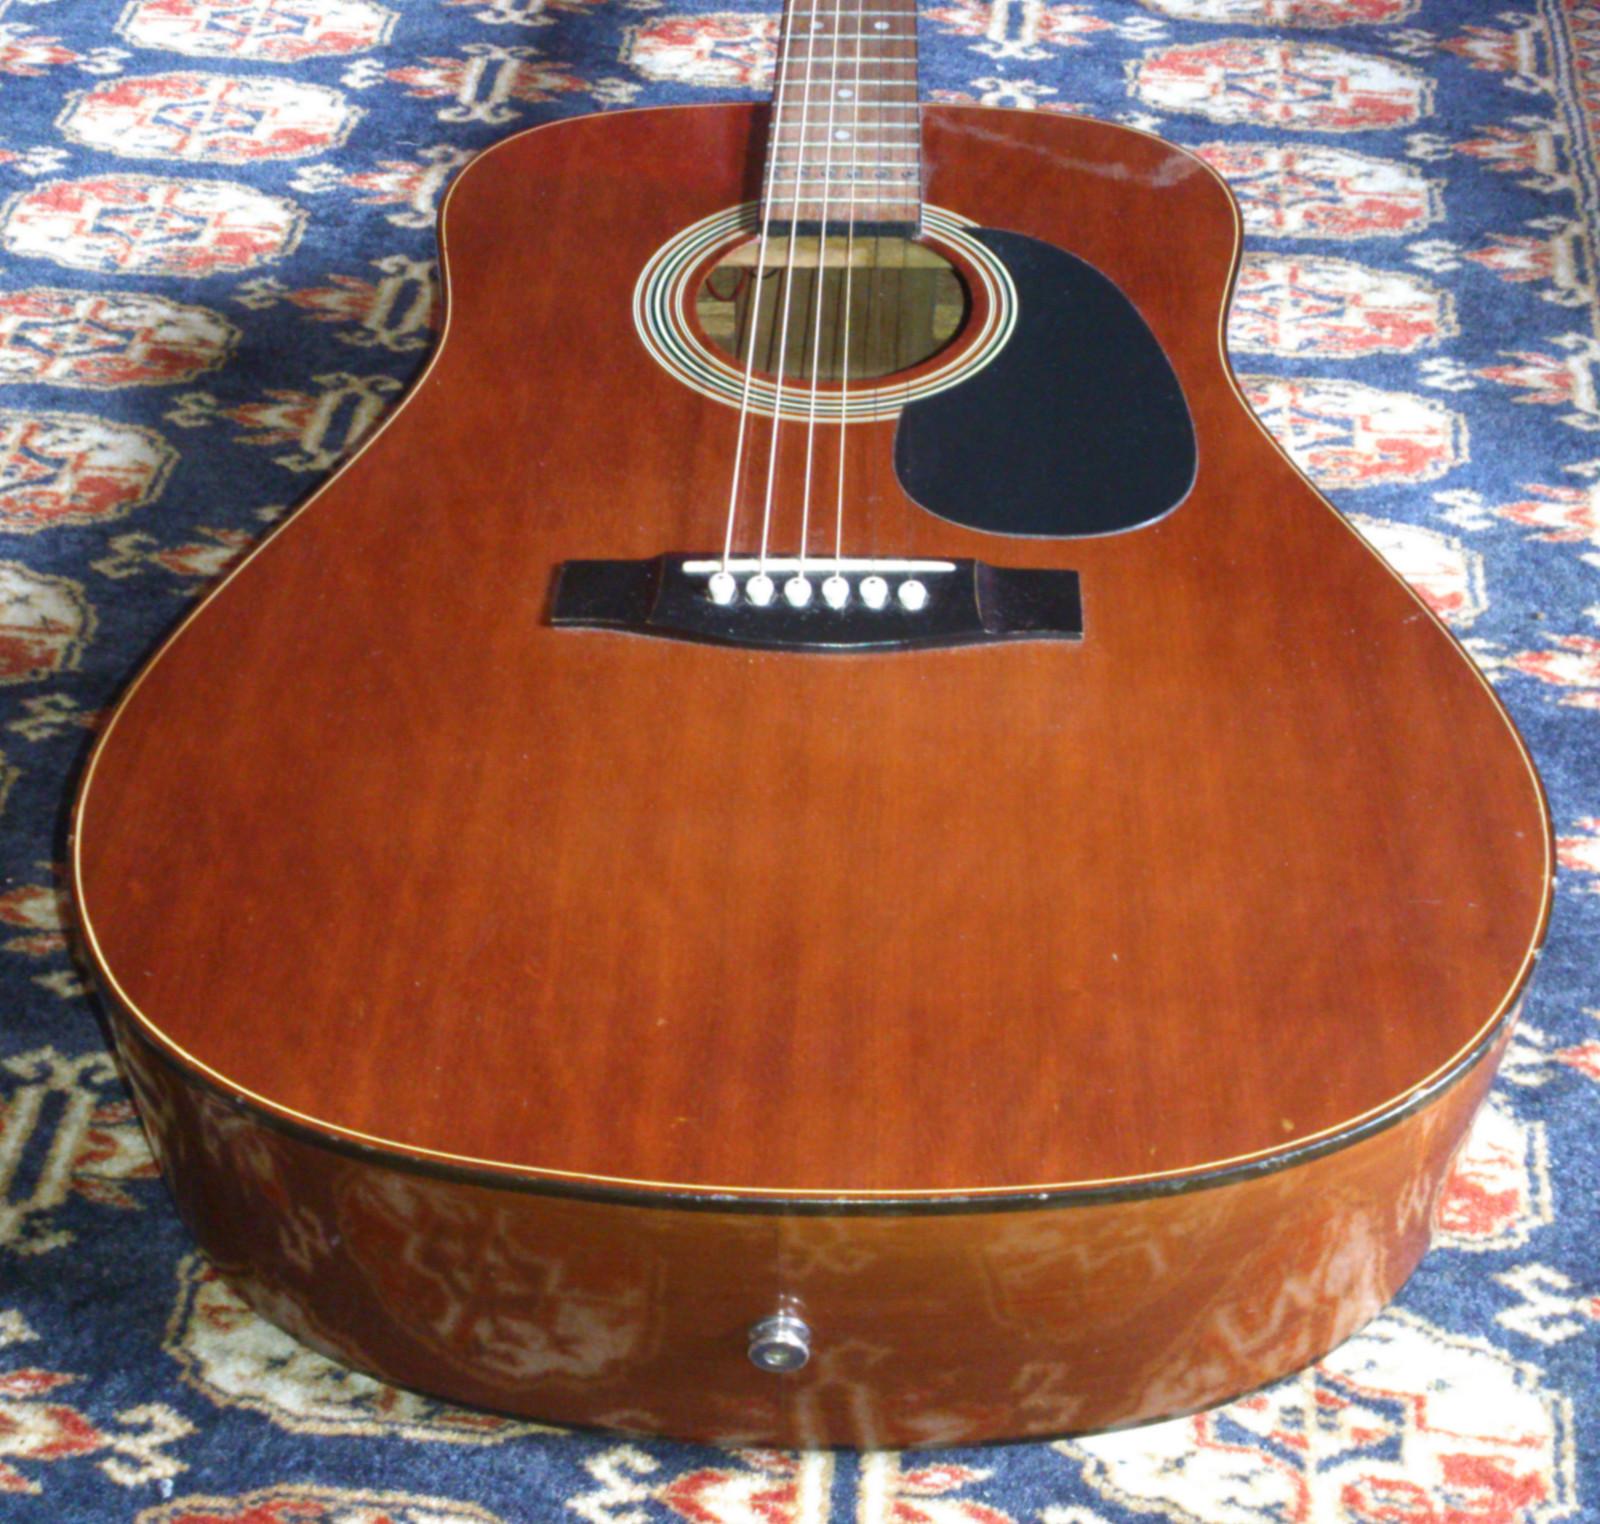 daion guitars down under daion 124en acoustic electric guitar for sale on. Black Bedroom Furniture Sets. Home Design Ideas